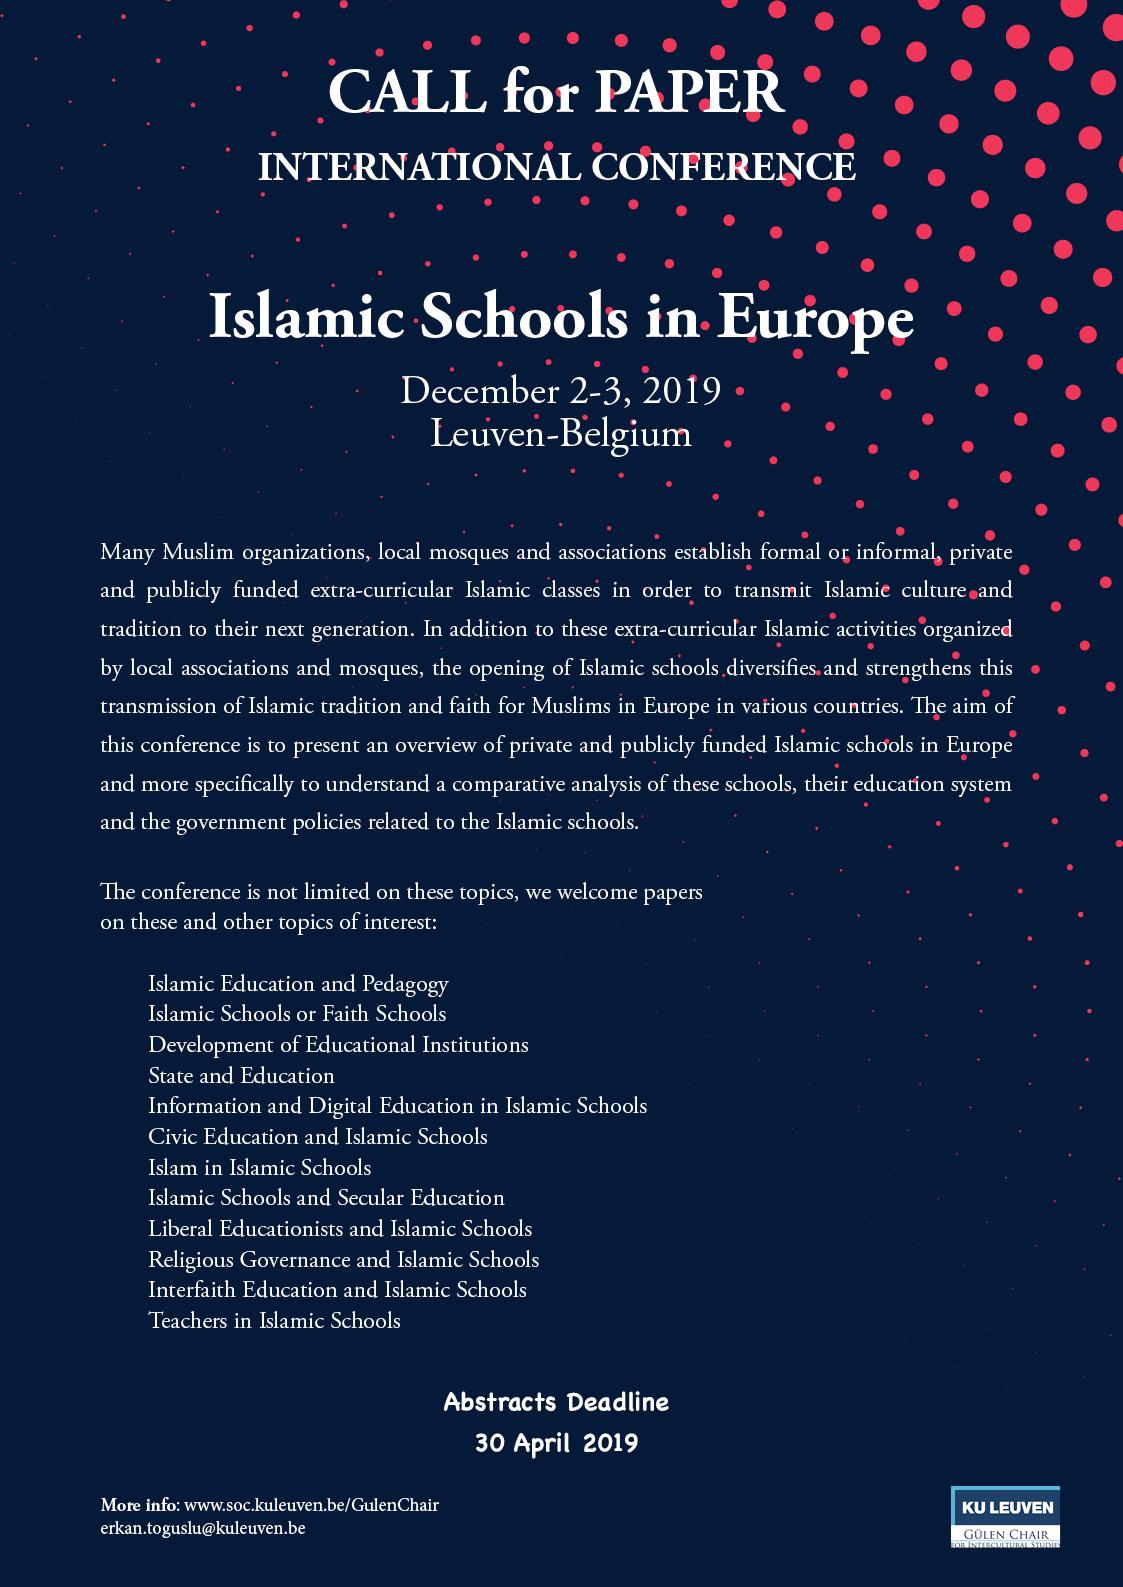 Calenda - Islamic Schools in Europe